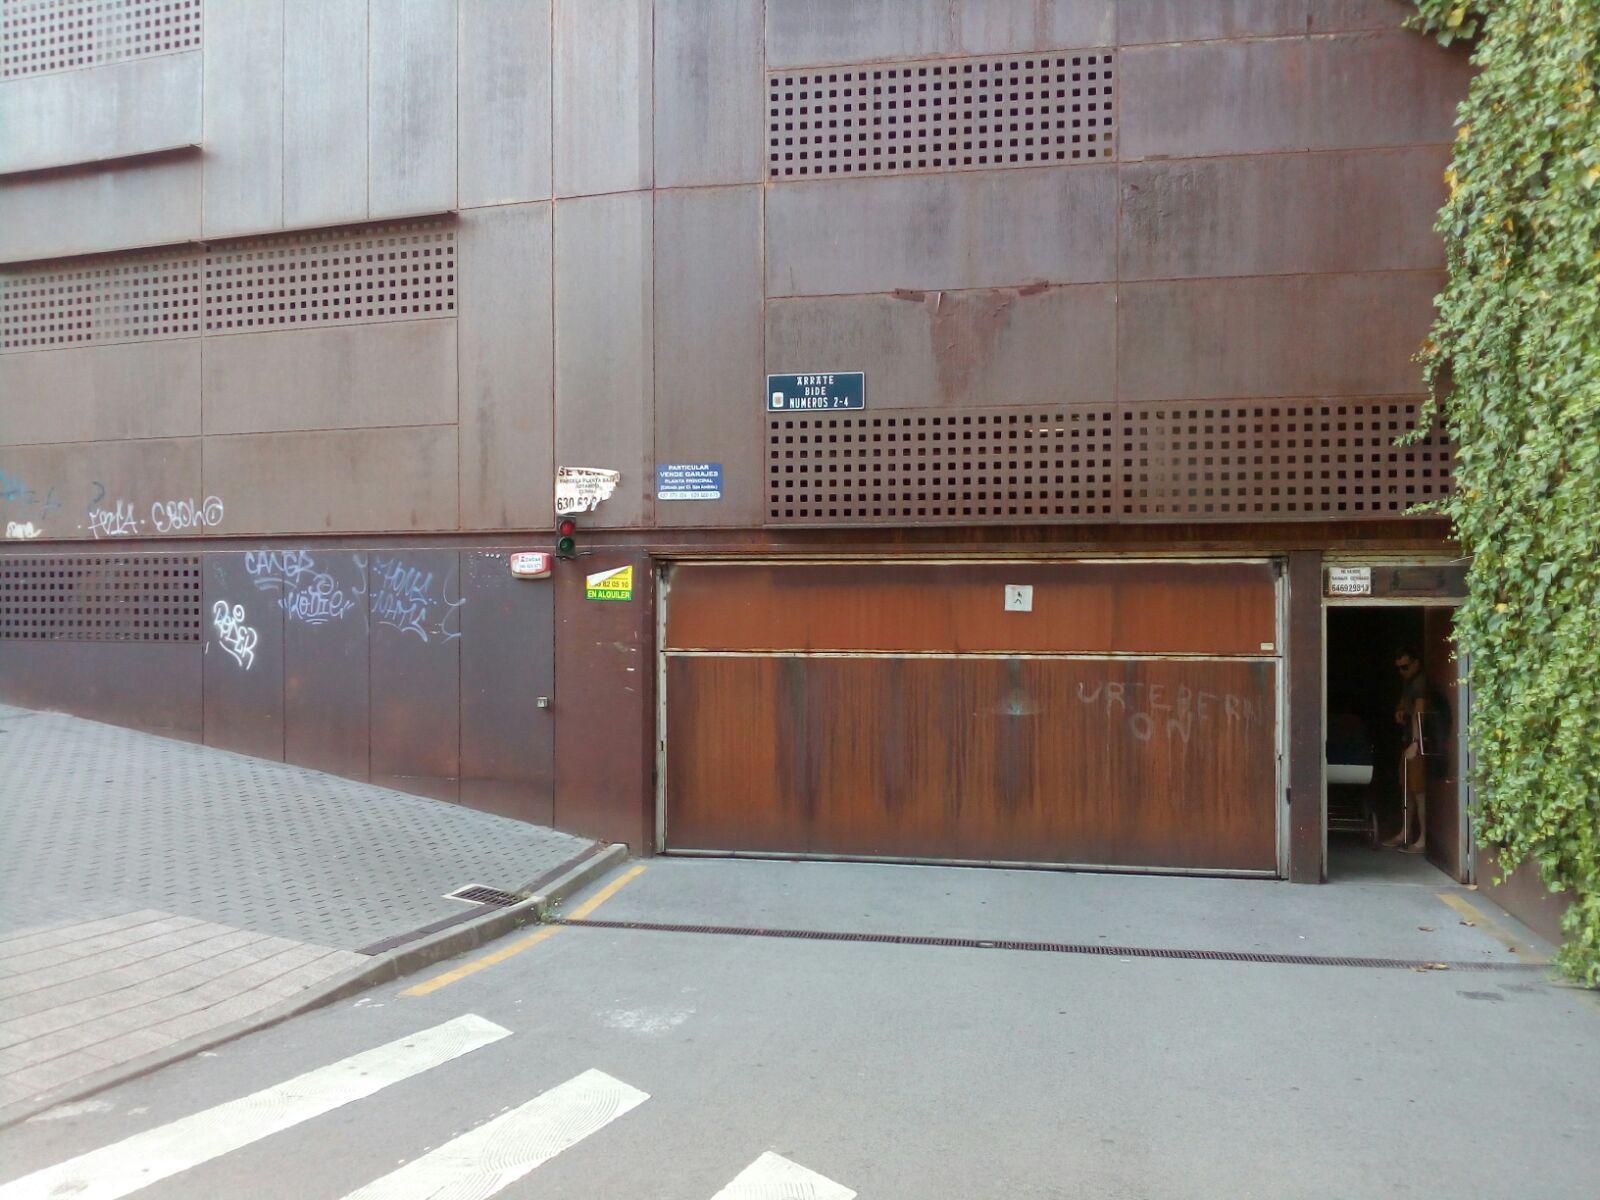 203686 - Parking Coche en alquiler en Eibar / Zona   Centro